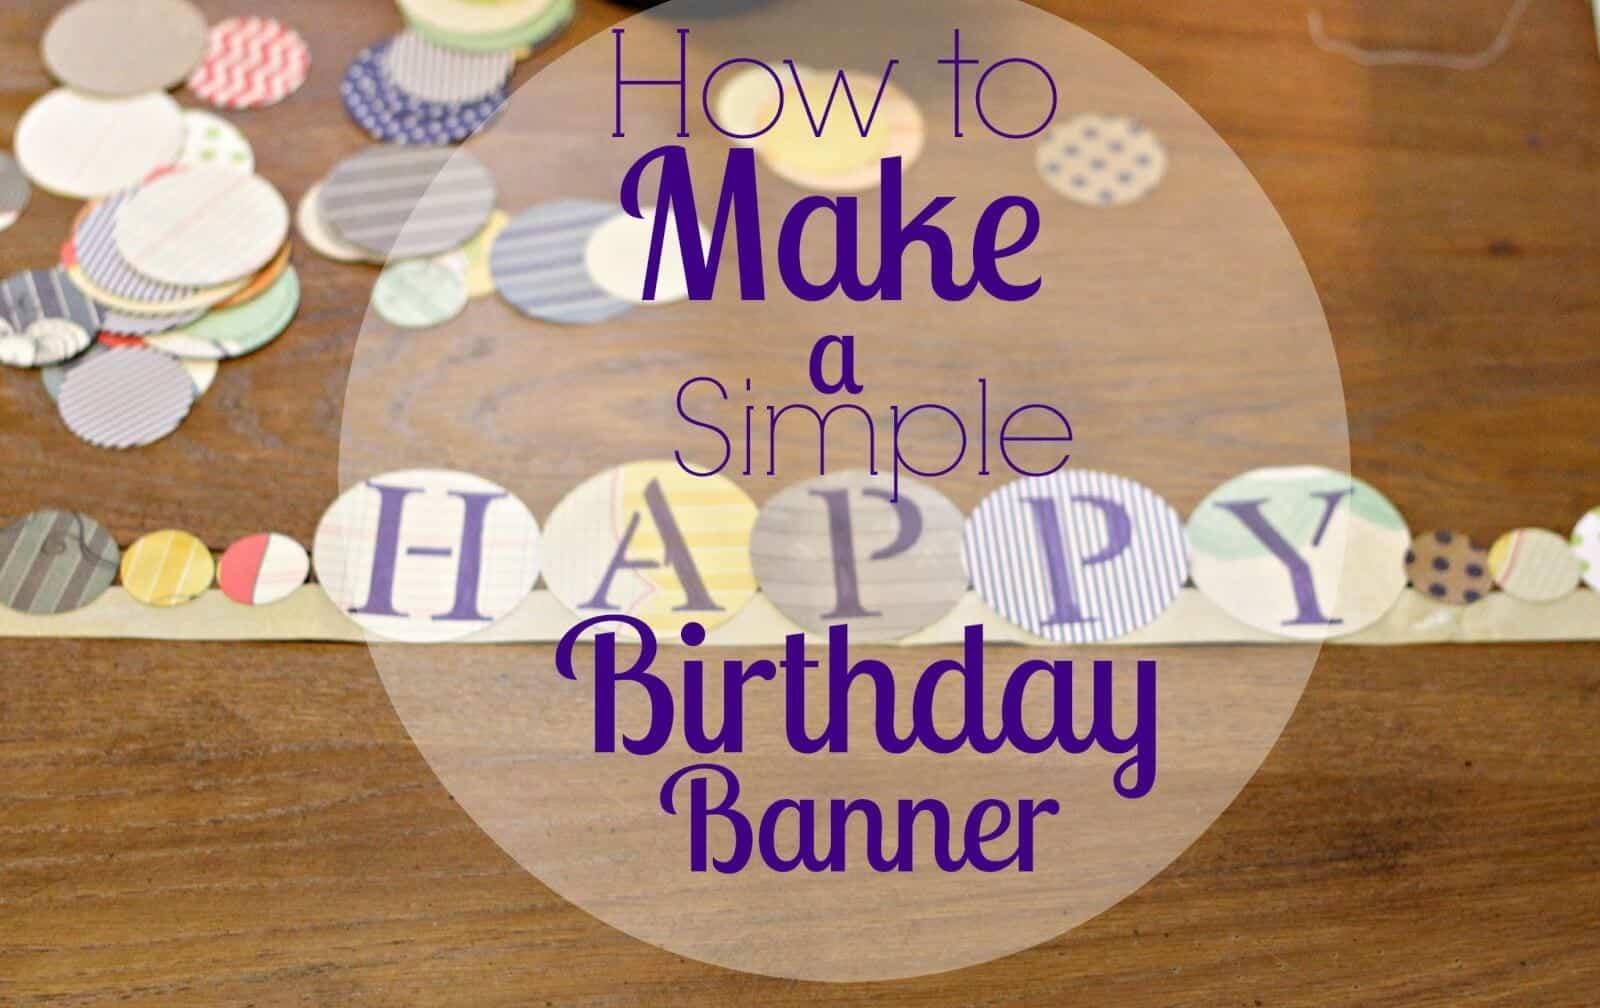 DIY Homemade Birthday Banner- So Easy!